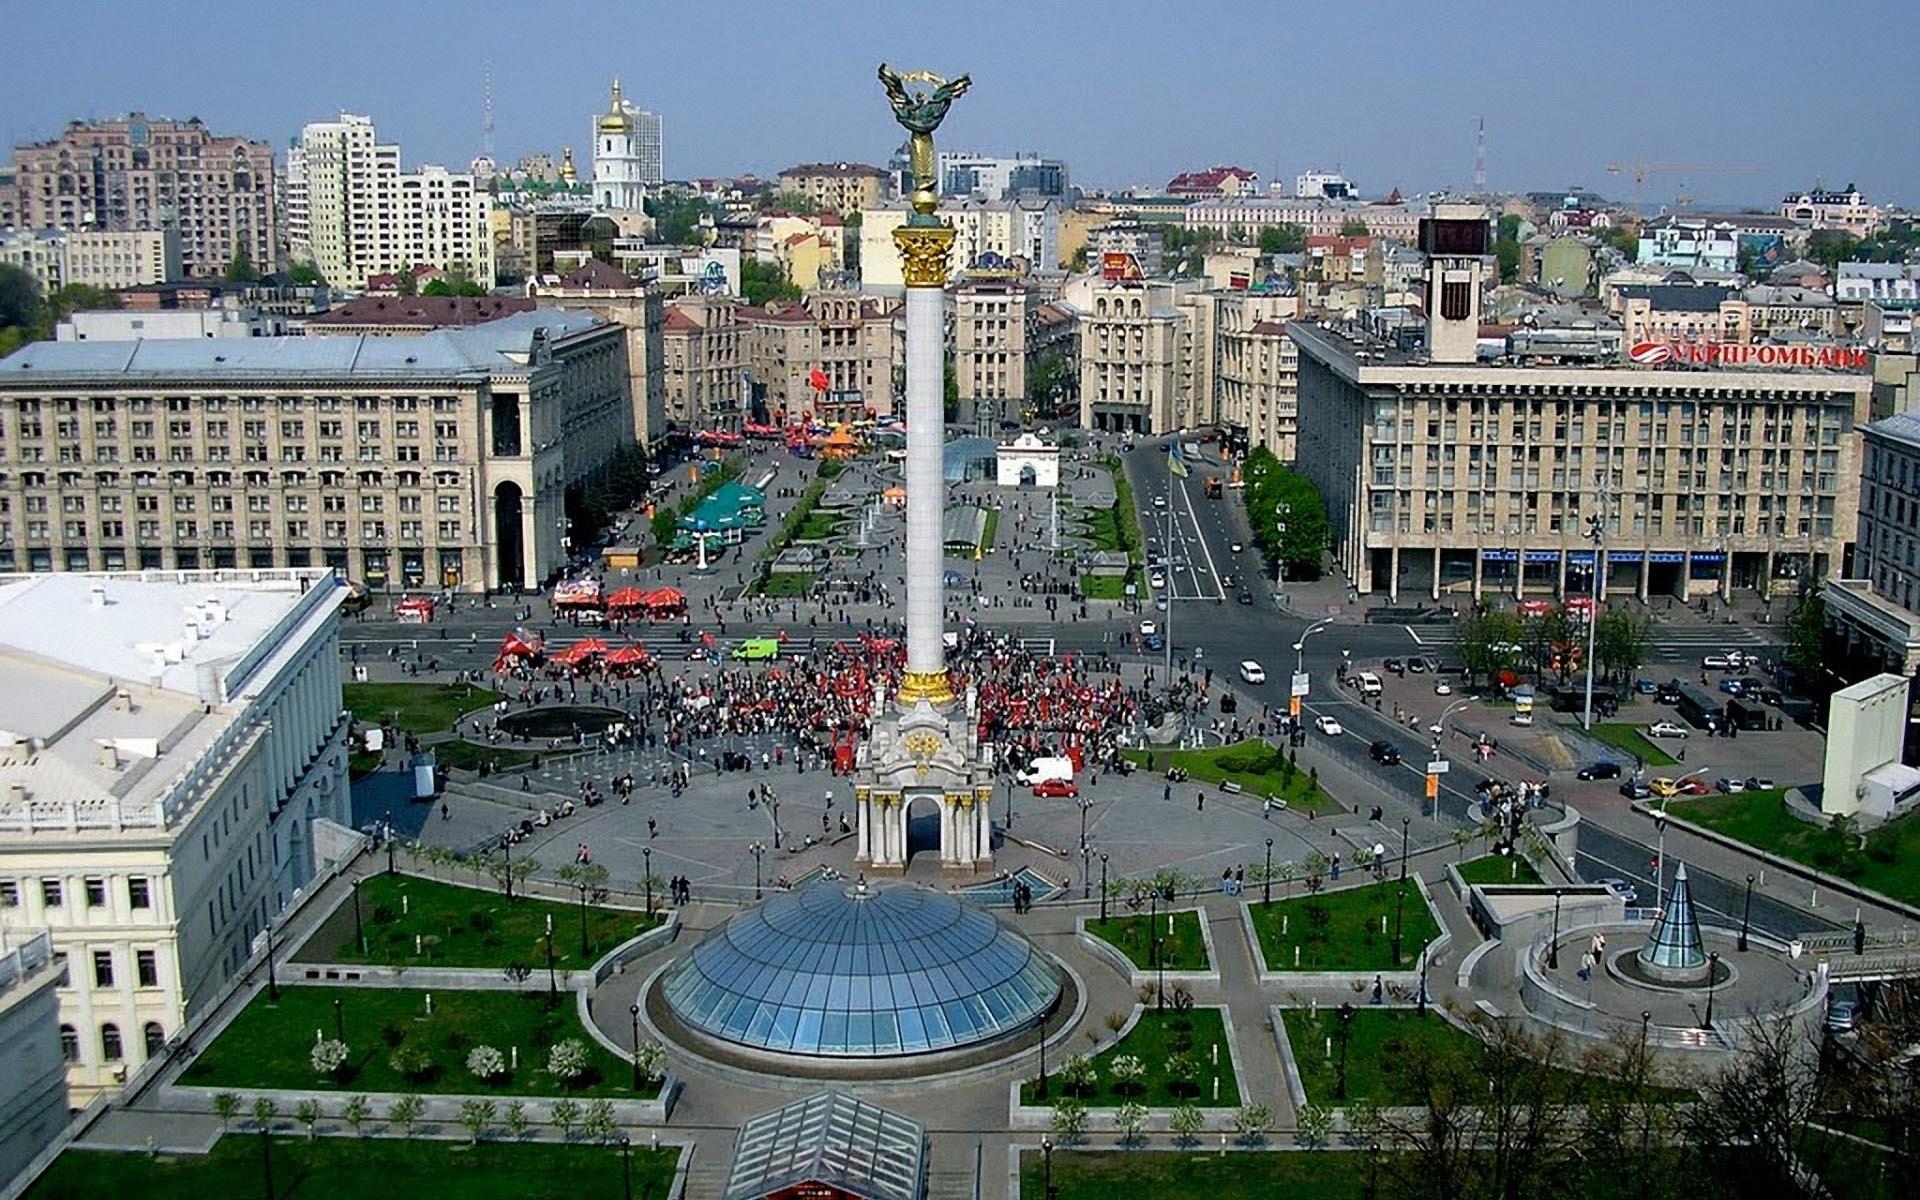 kiev-square-wallpapers_31587_1920x1200